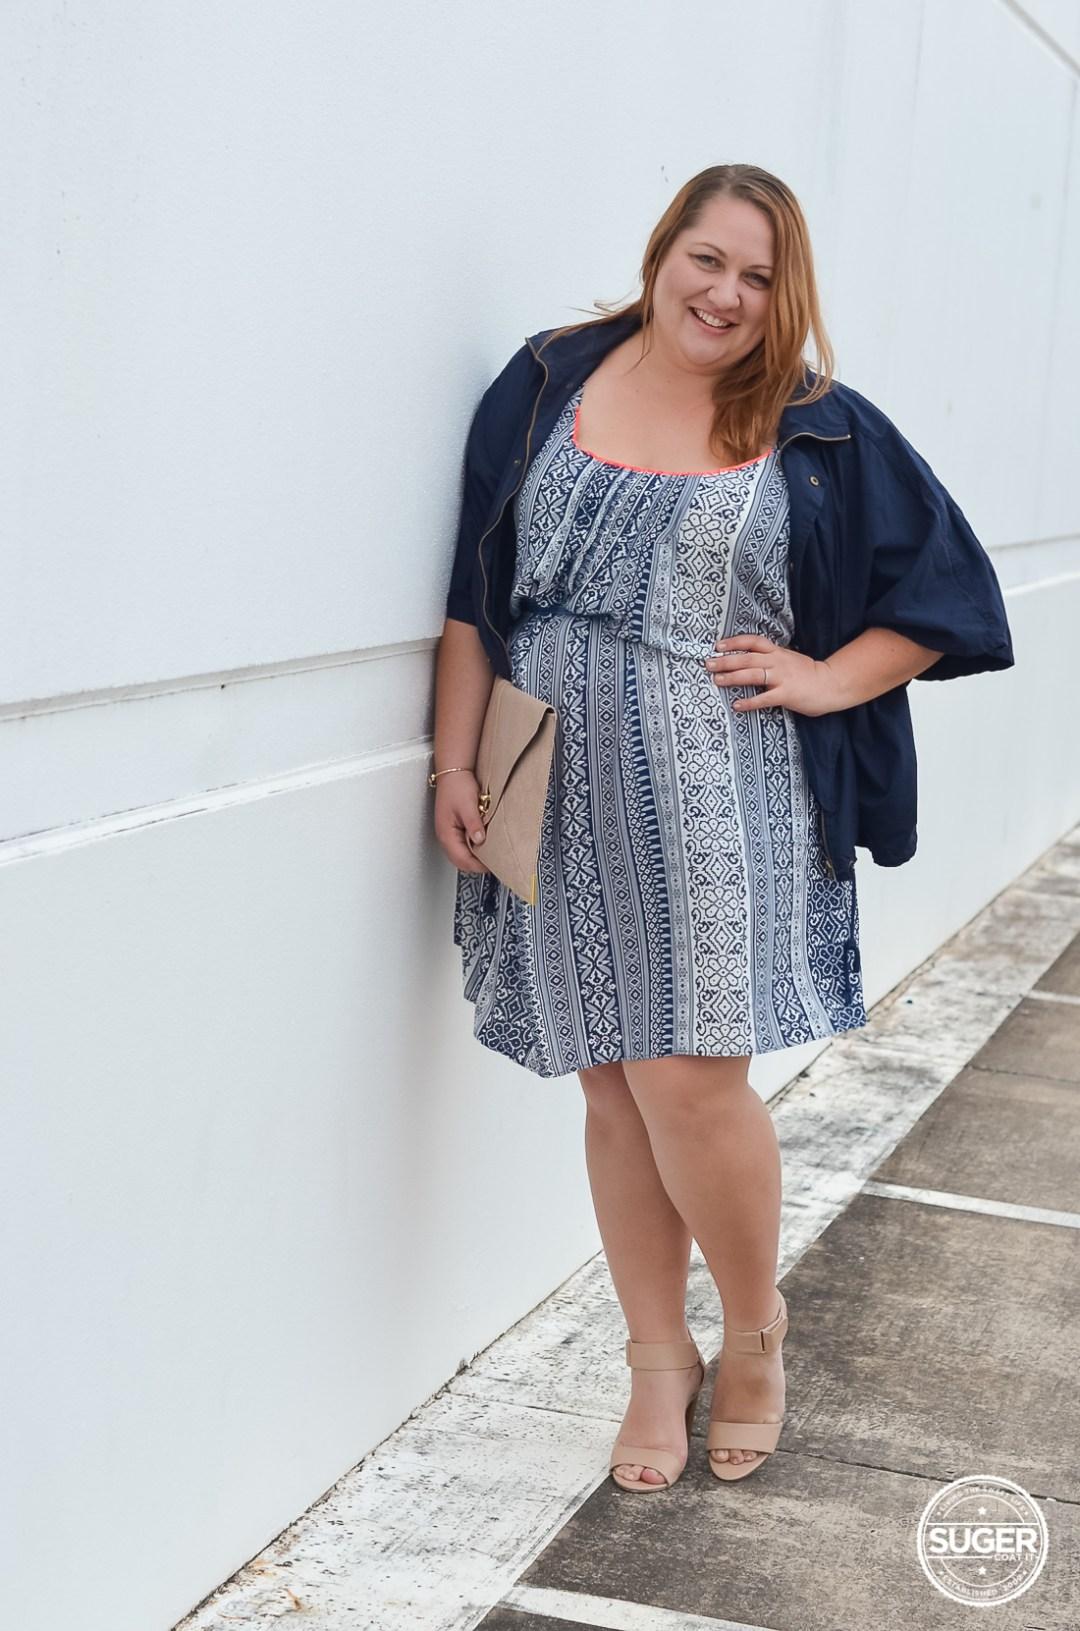 beme australia plus size fashion blogger review-10